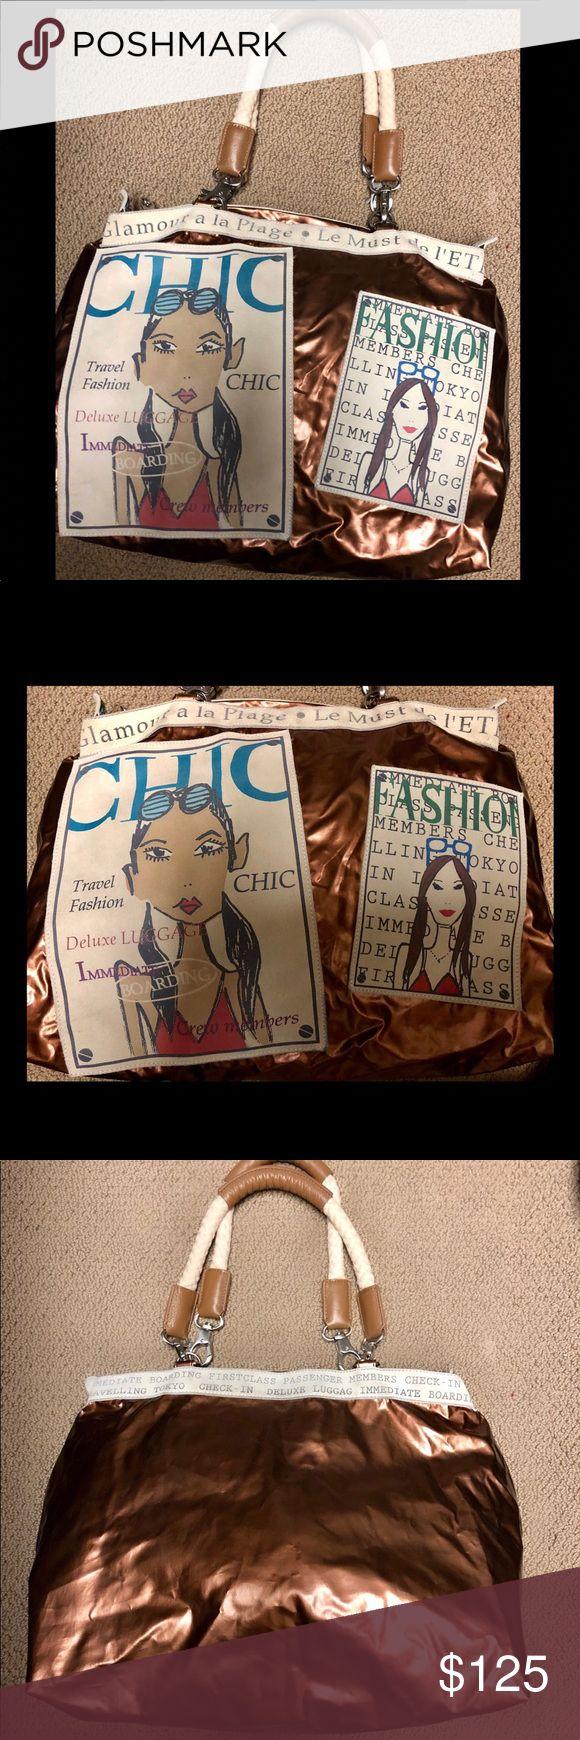 "Funky Barbara Rihl Paris large tote. Hardly used! Funky Barbara Rihl Paris large tote. Hardly used! Sz 18x14x8.5"" Bags Totes"